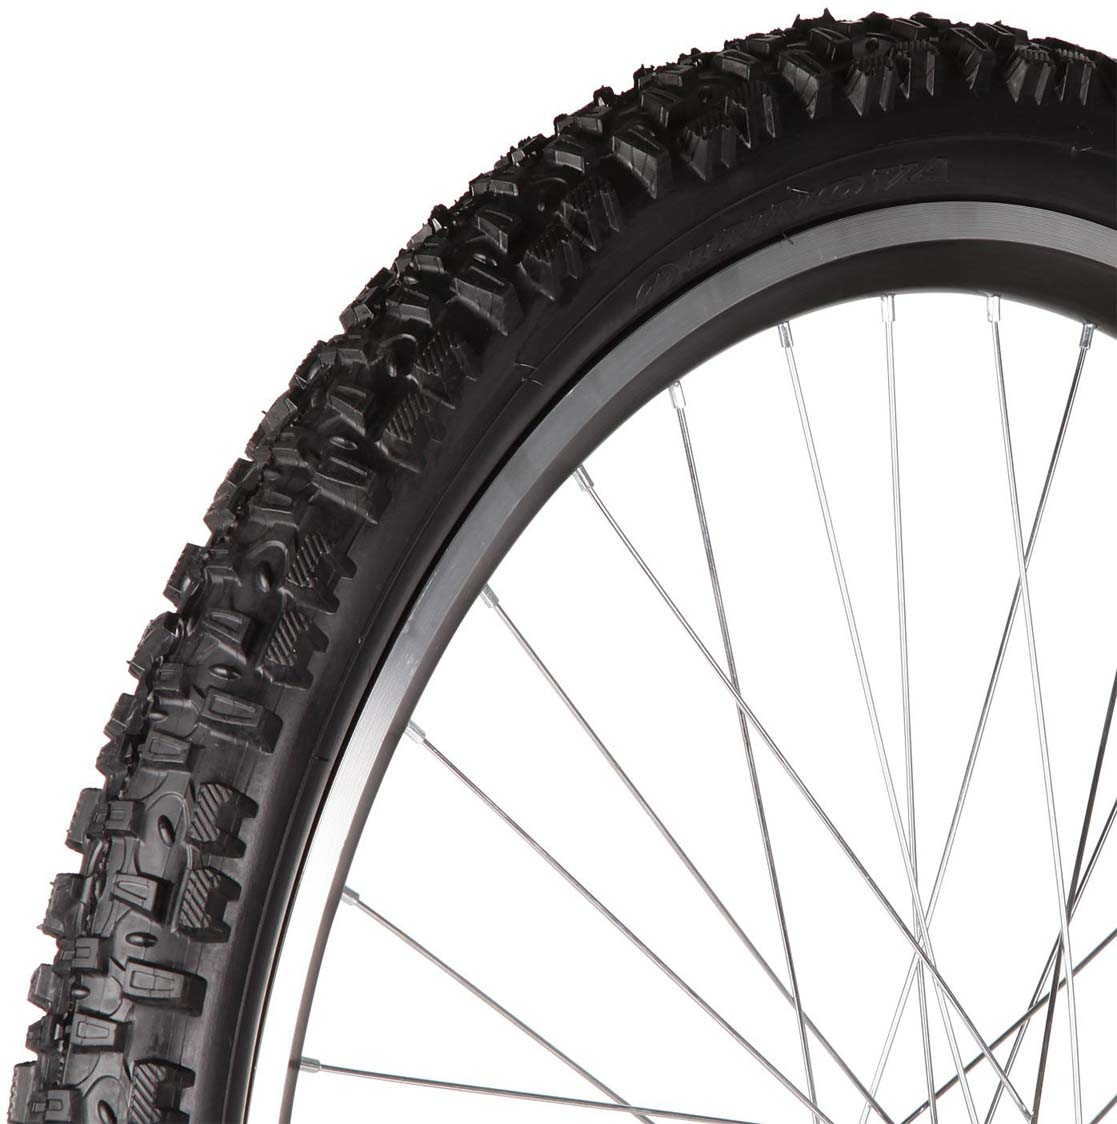 Покрышка велосипедная Innova IA-2024, 26 х 2,35